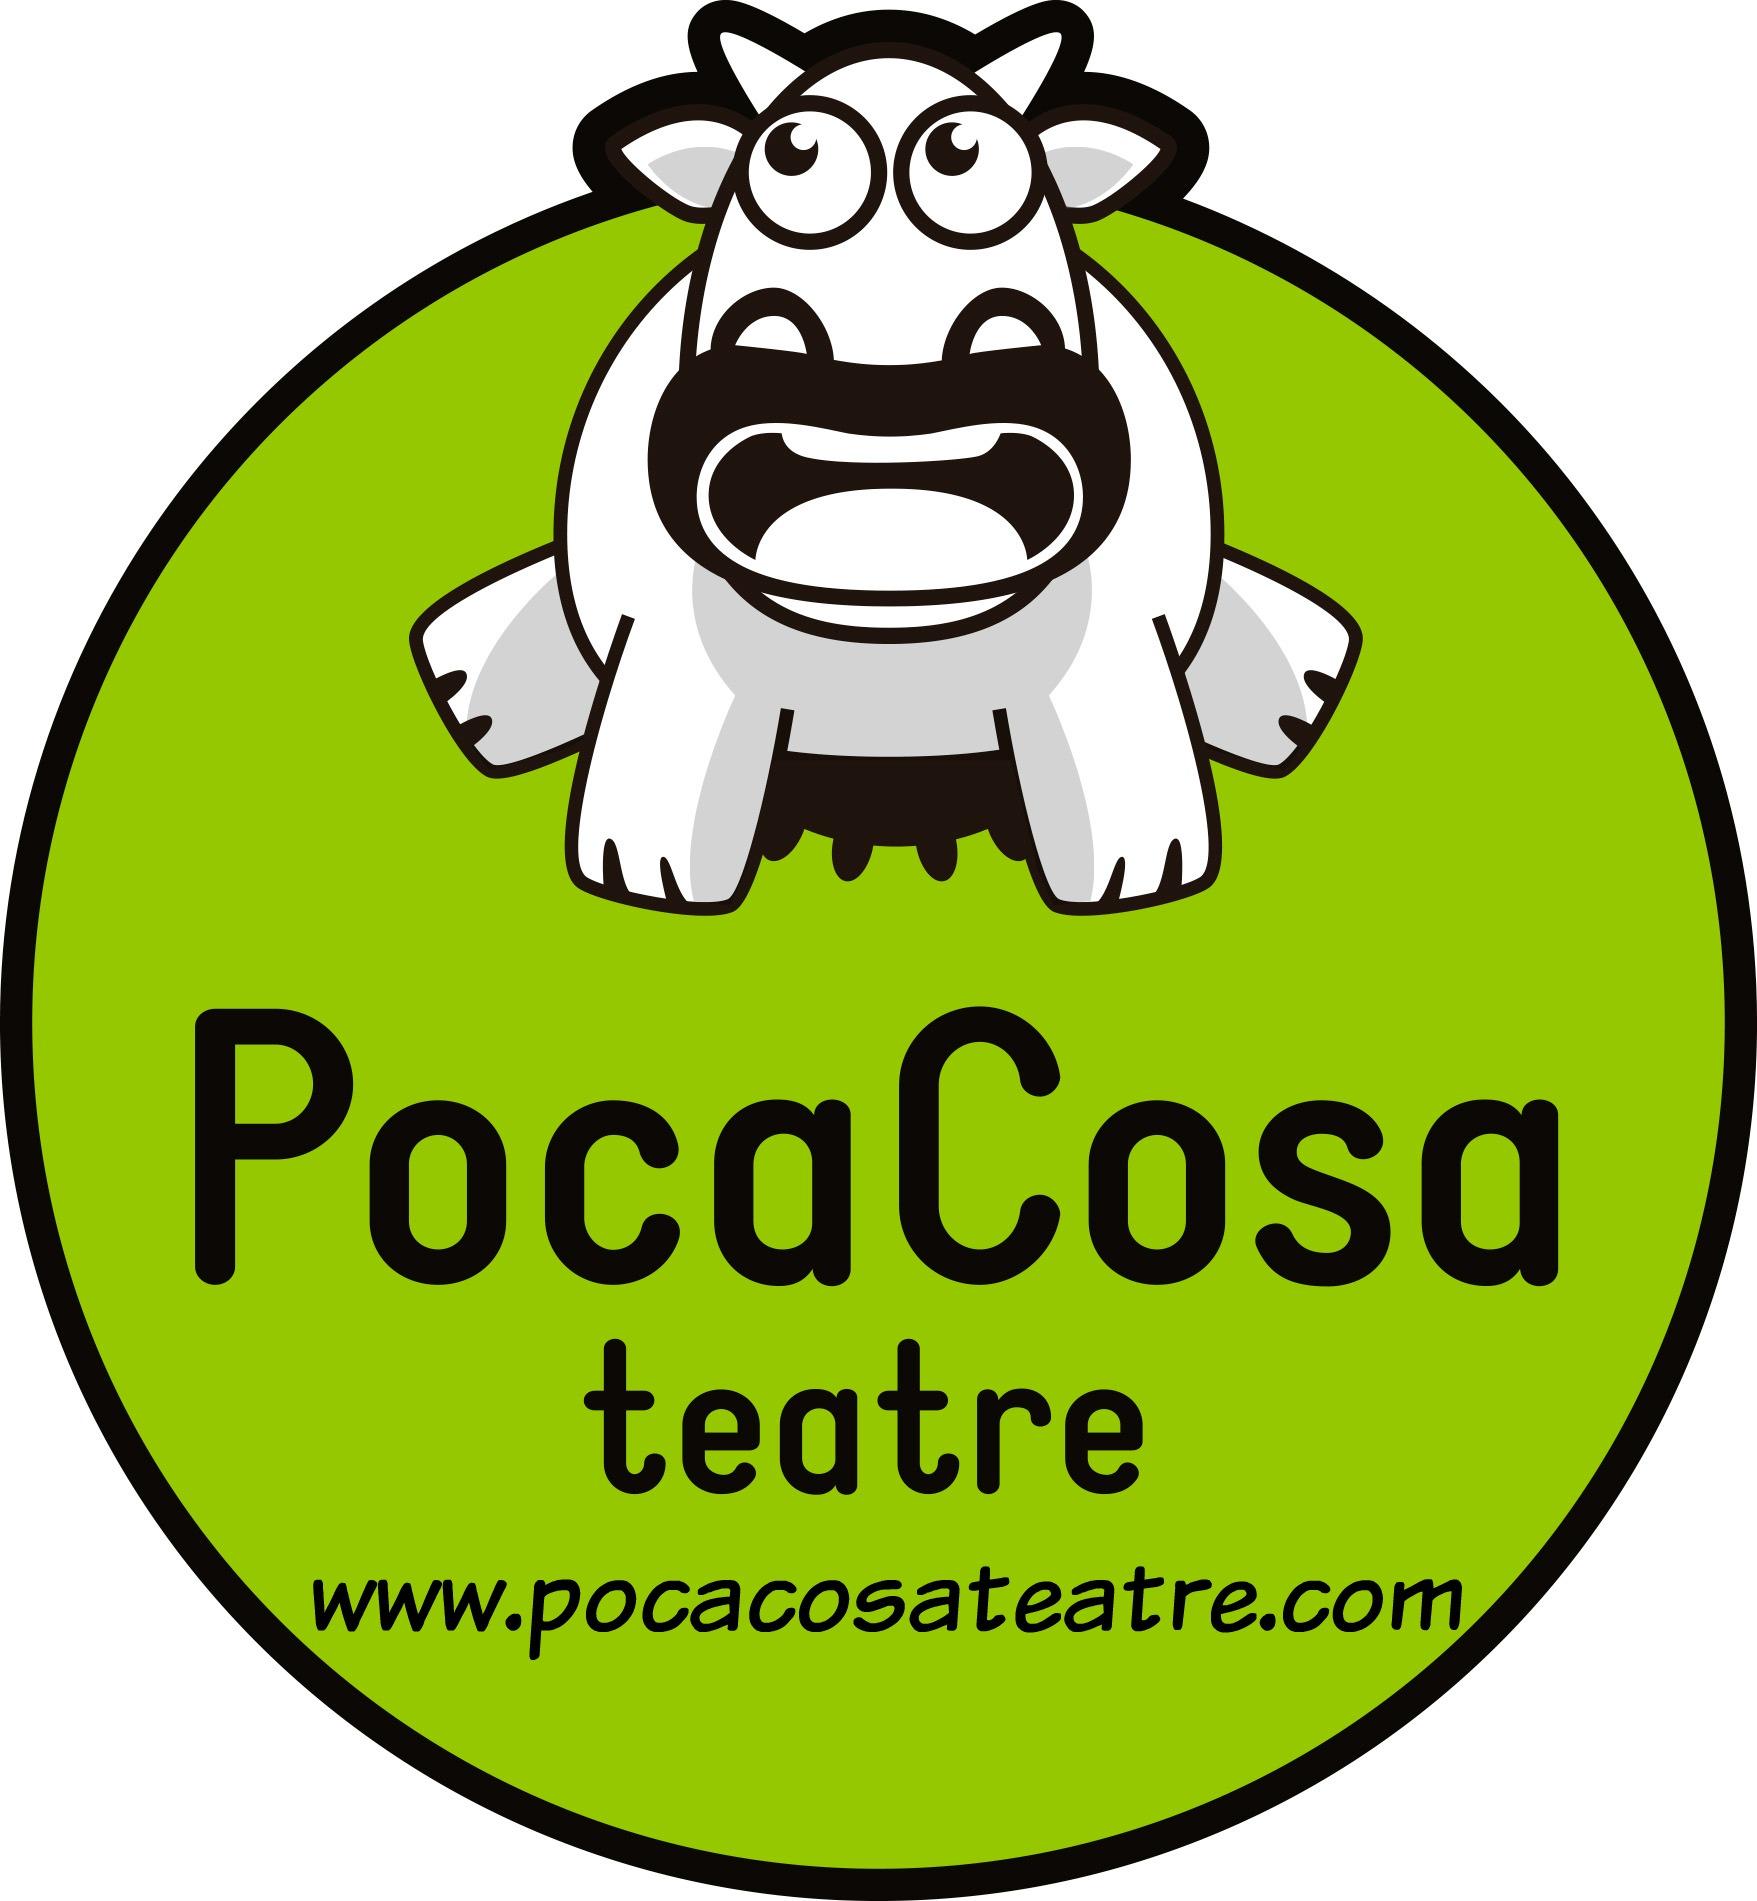 logo Pocacosa Teatre